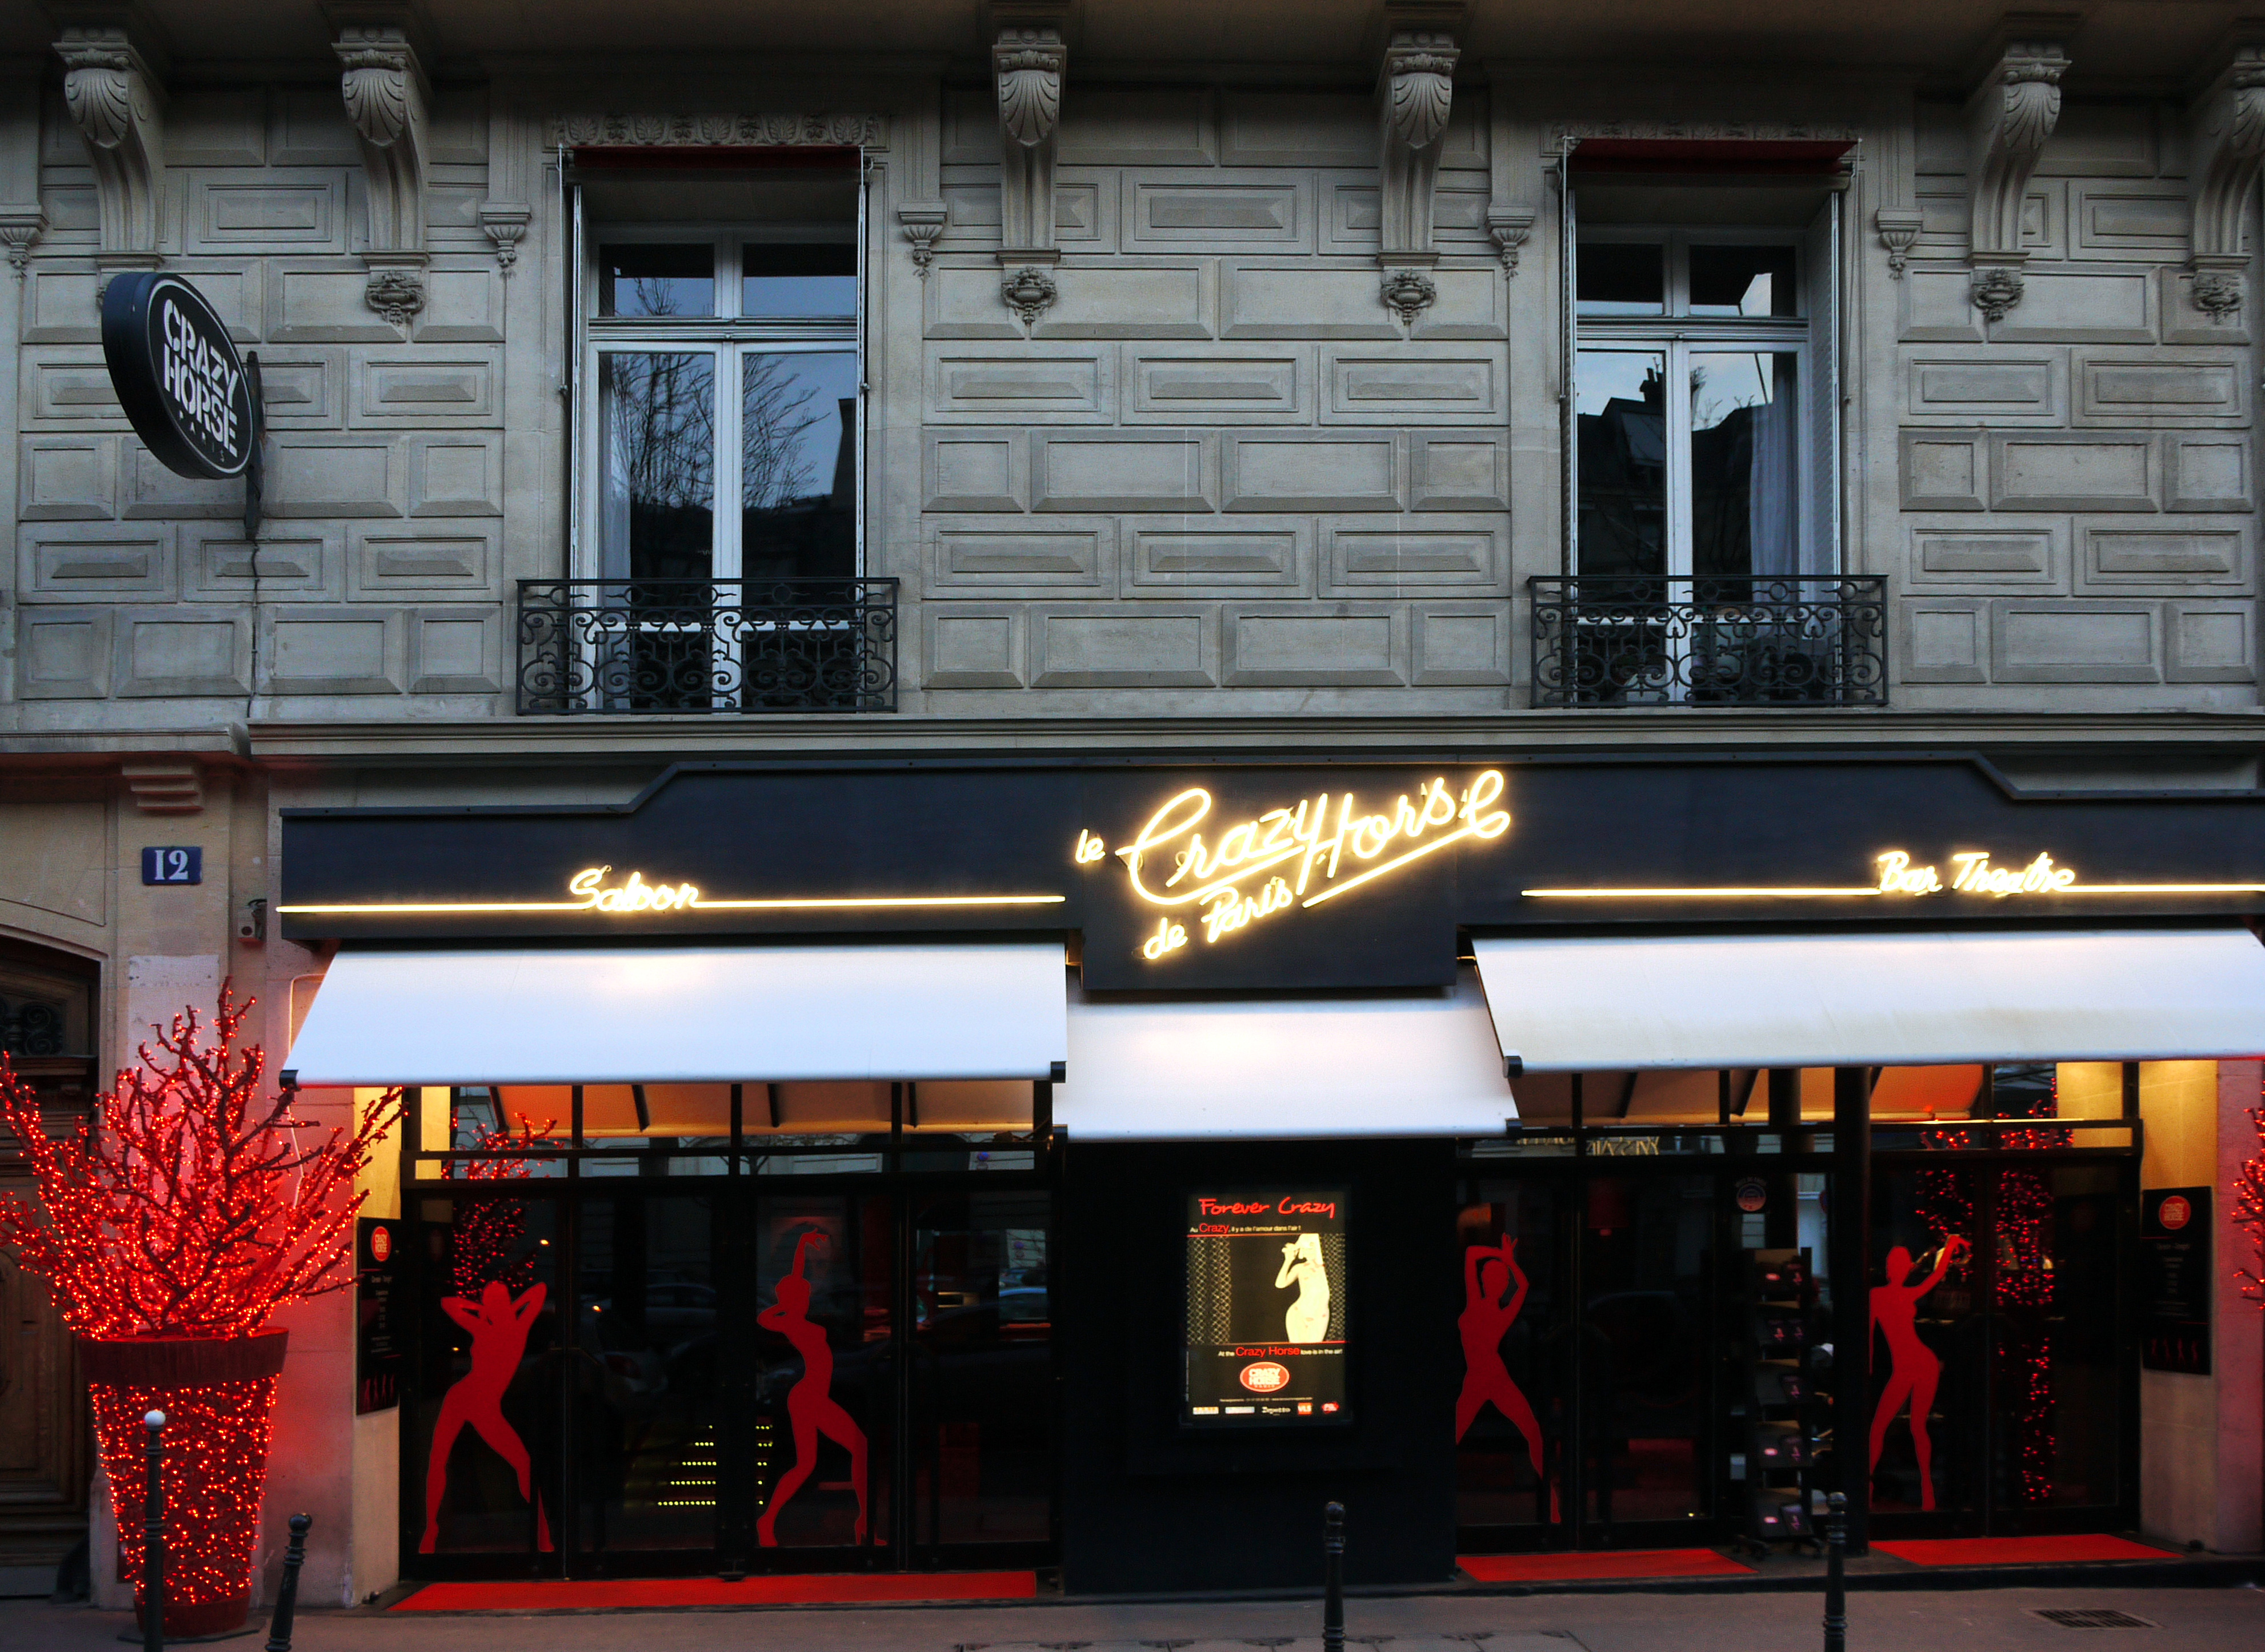 Bar Restaurant Qui Diffuse France Pays Bas